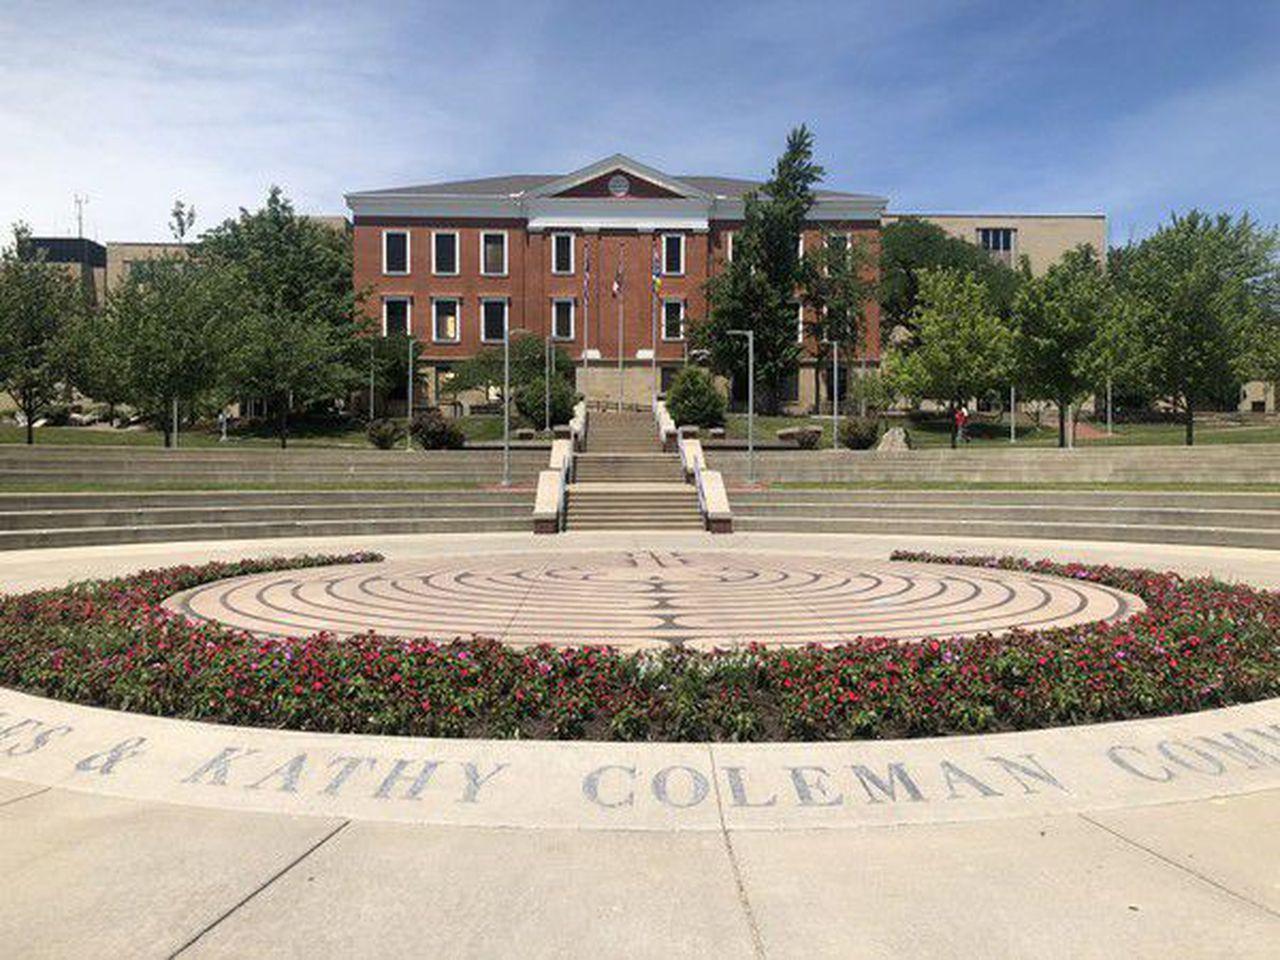 University Of Akron Cancels In-Person Classes Due To regarding Akron University Spring Break 2020